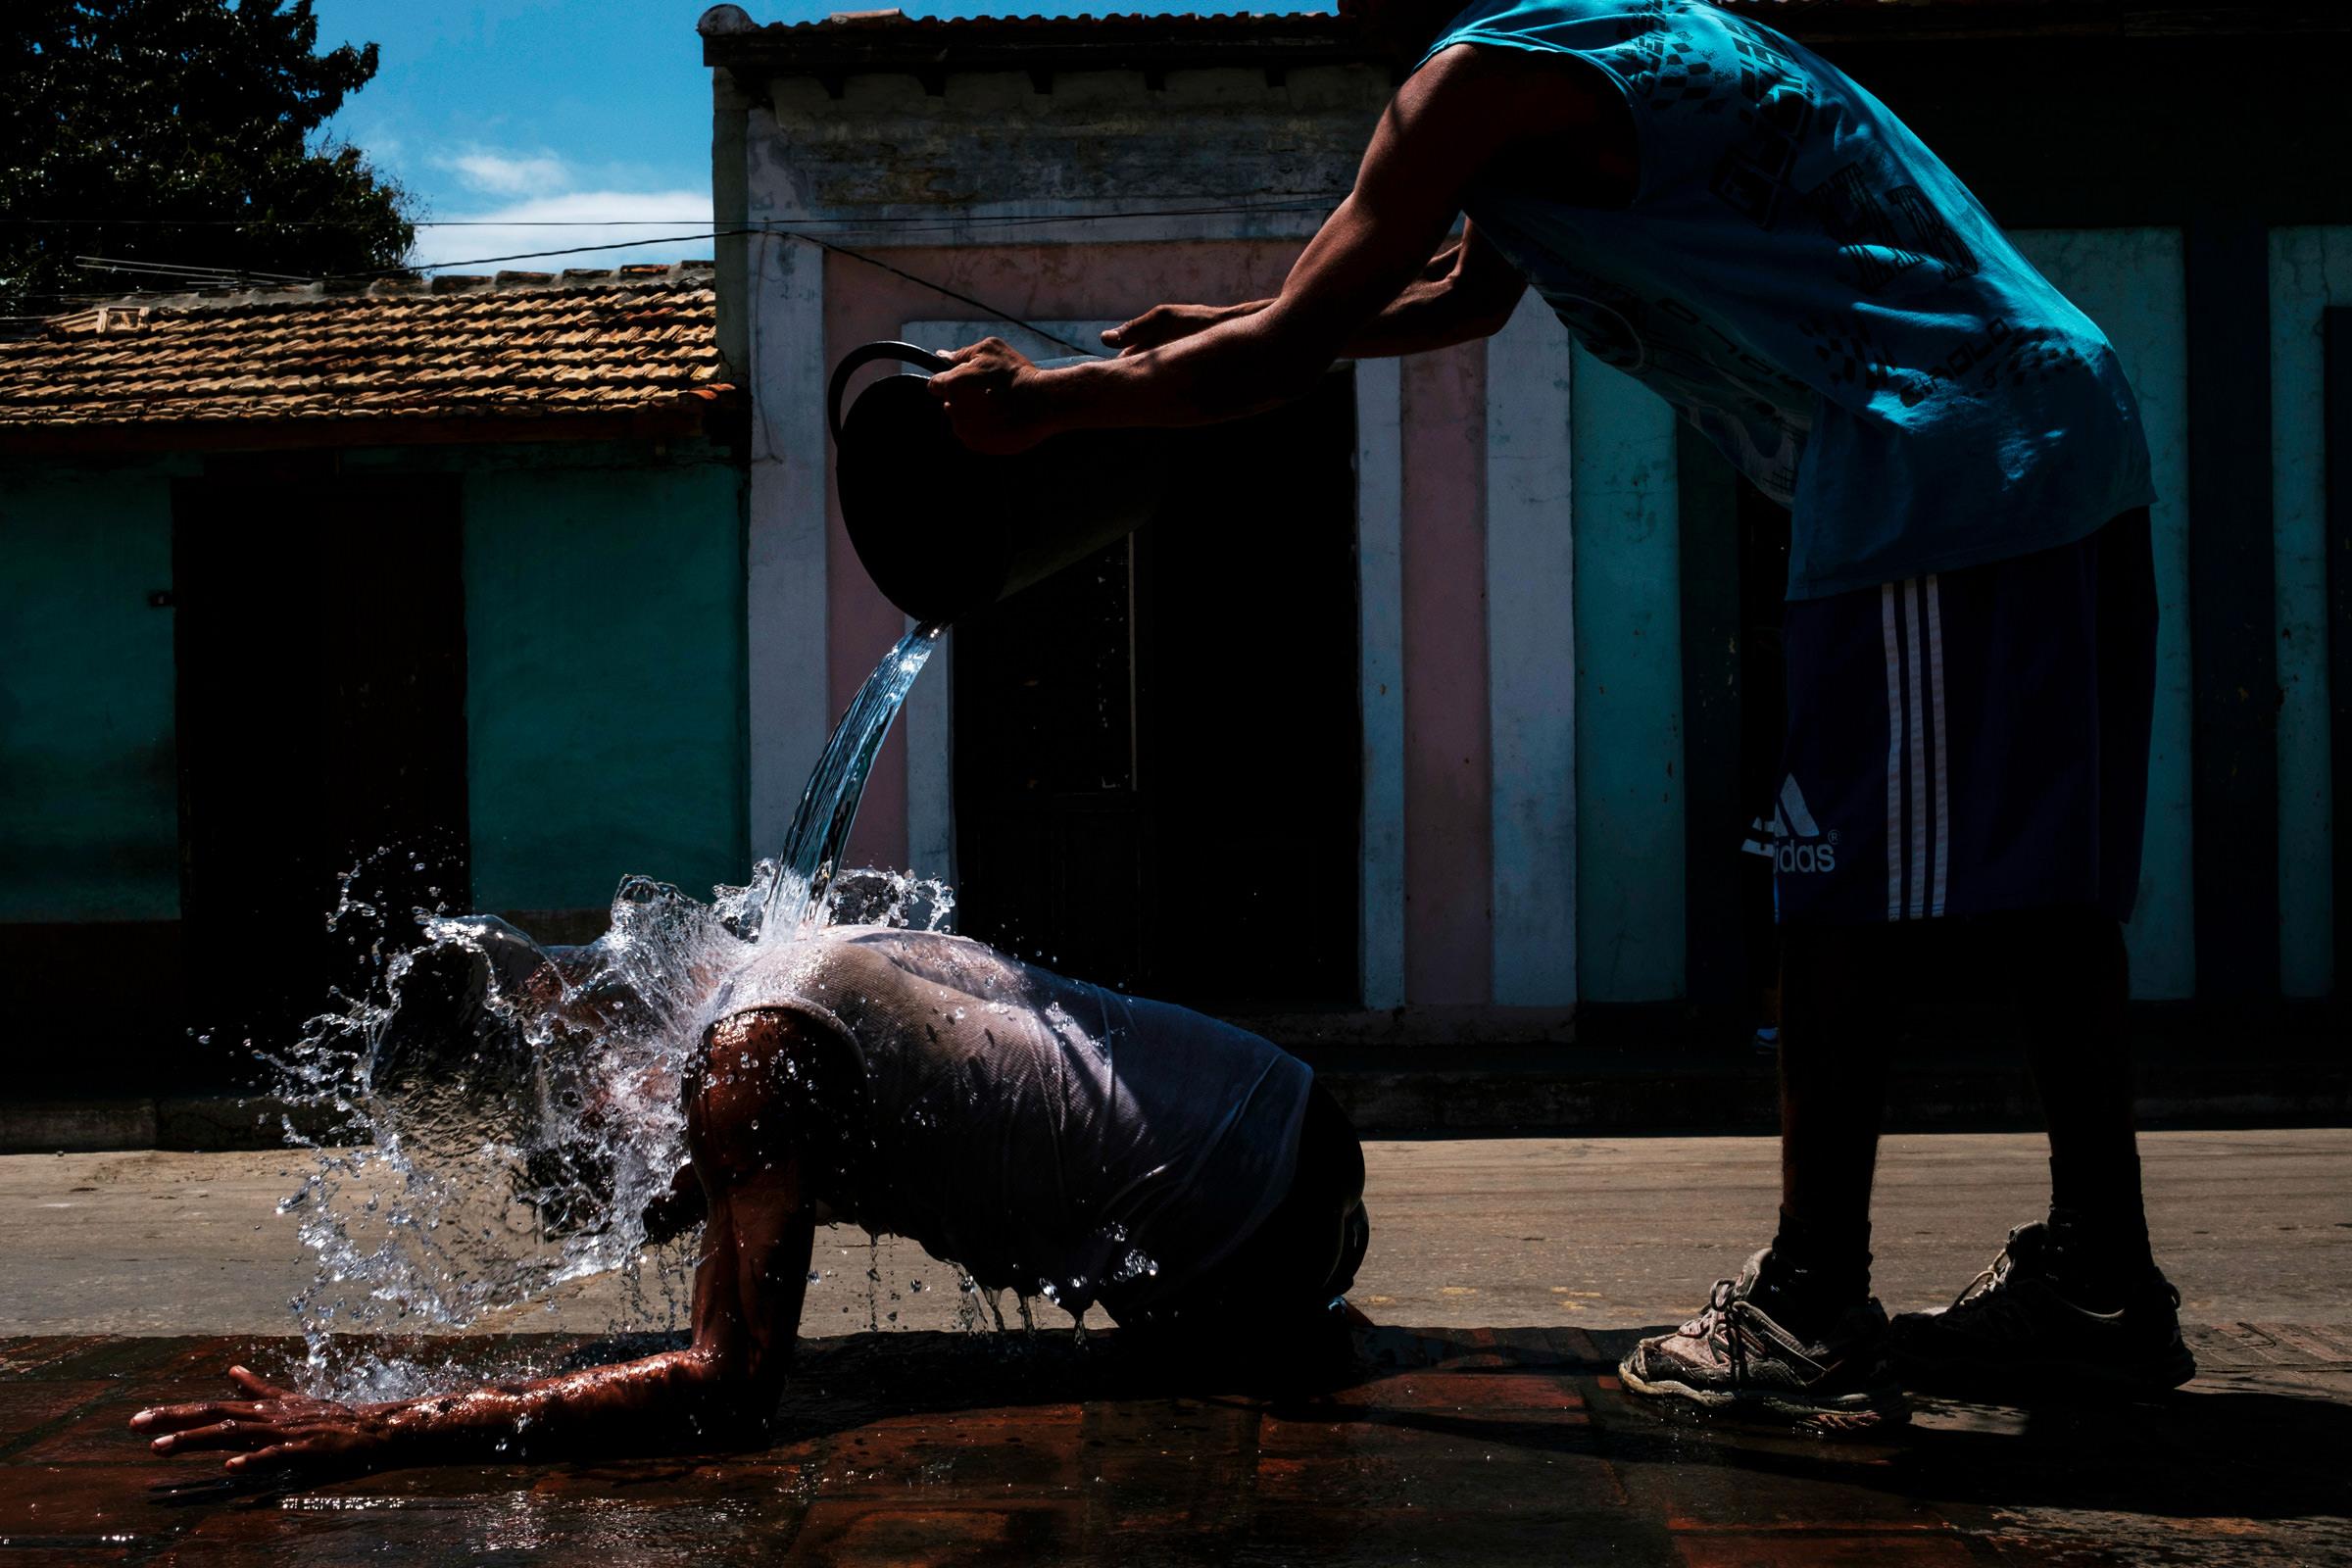 Cuba-Street-Photography-13